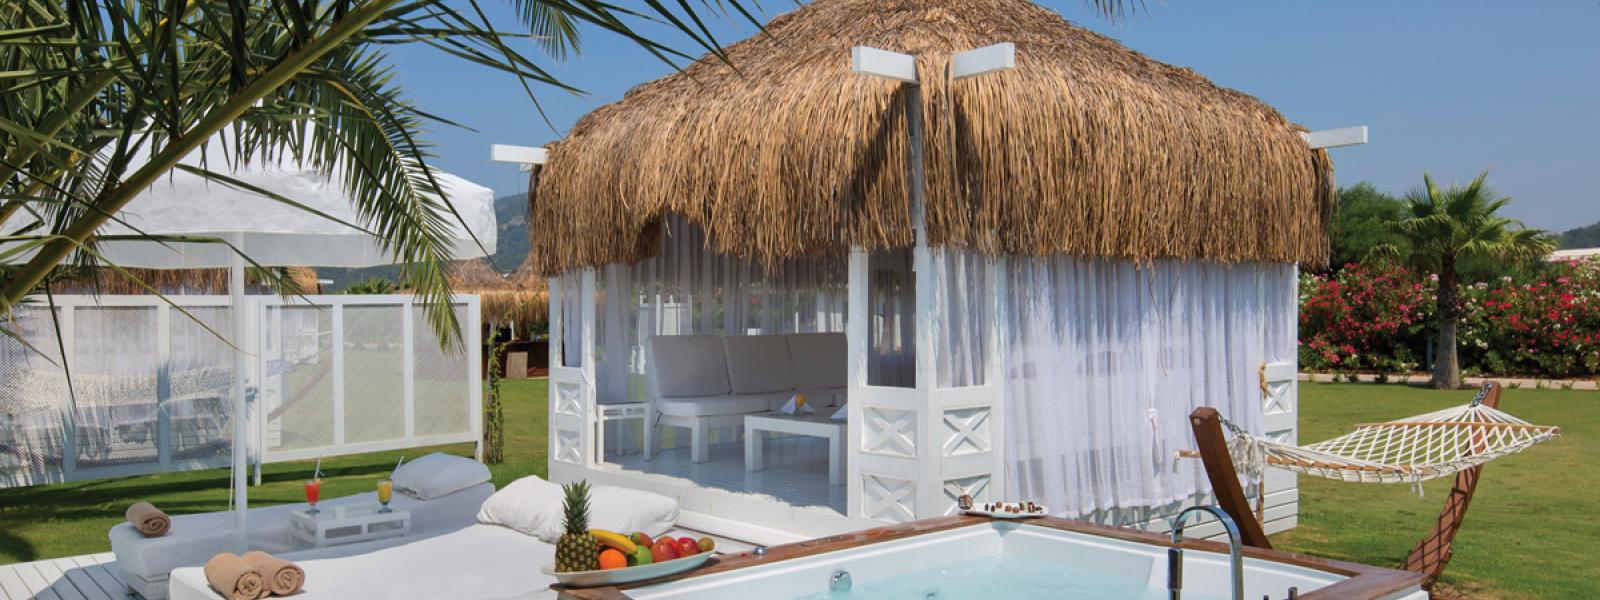 Hilton Dalaman Sarigerme Resort & Spa, Turkey, enjoy a romantic honeymoon